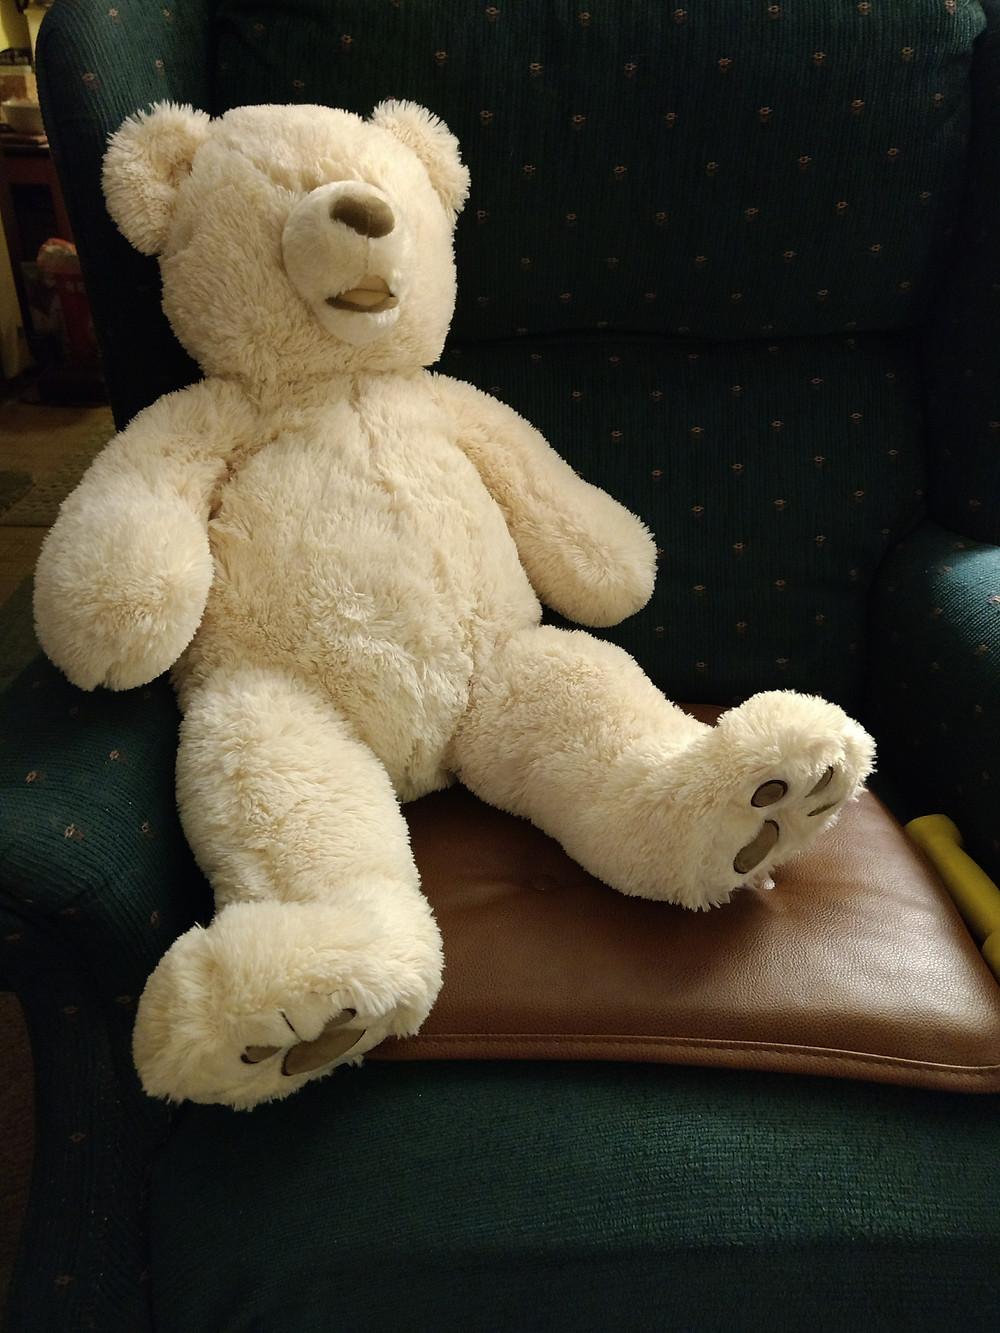 Newest Bear!